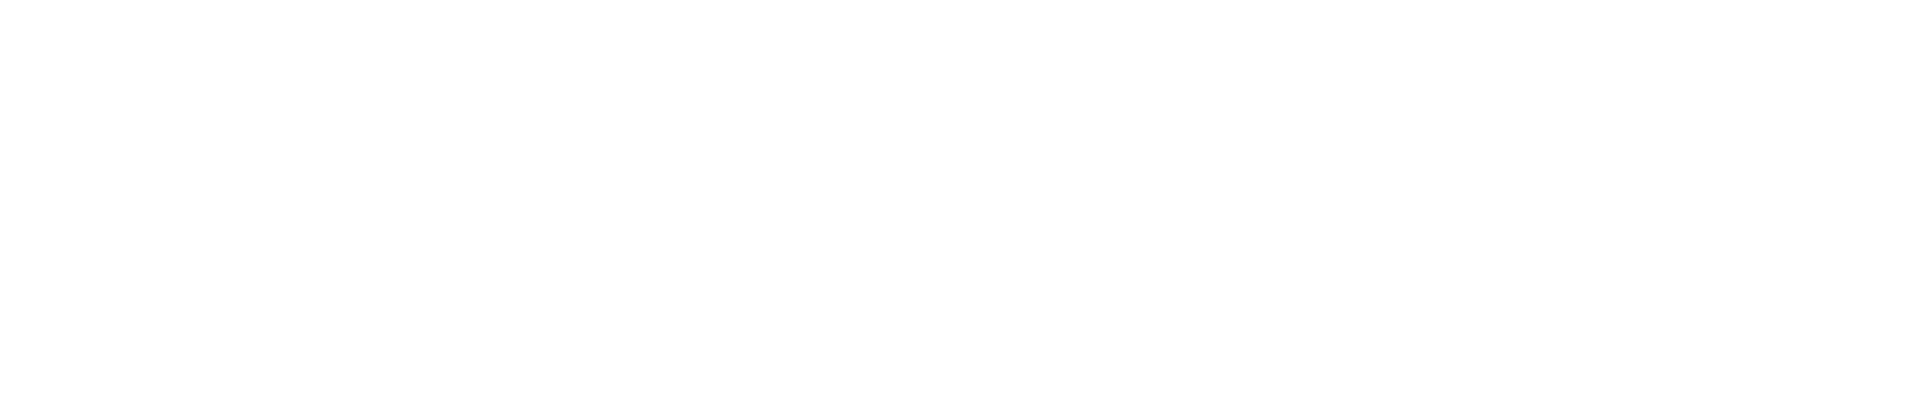 Banner Bedaid tuvalet minderi  Logo